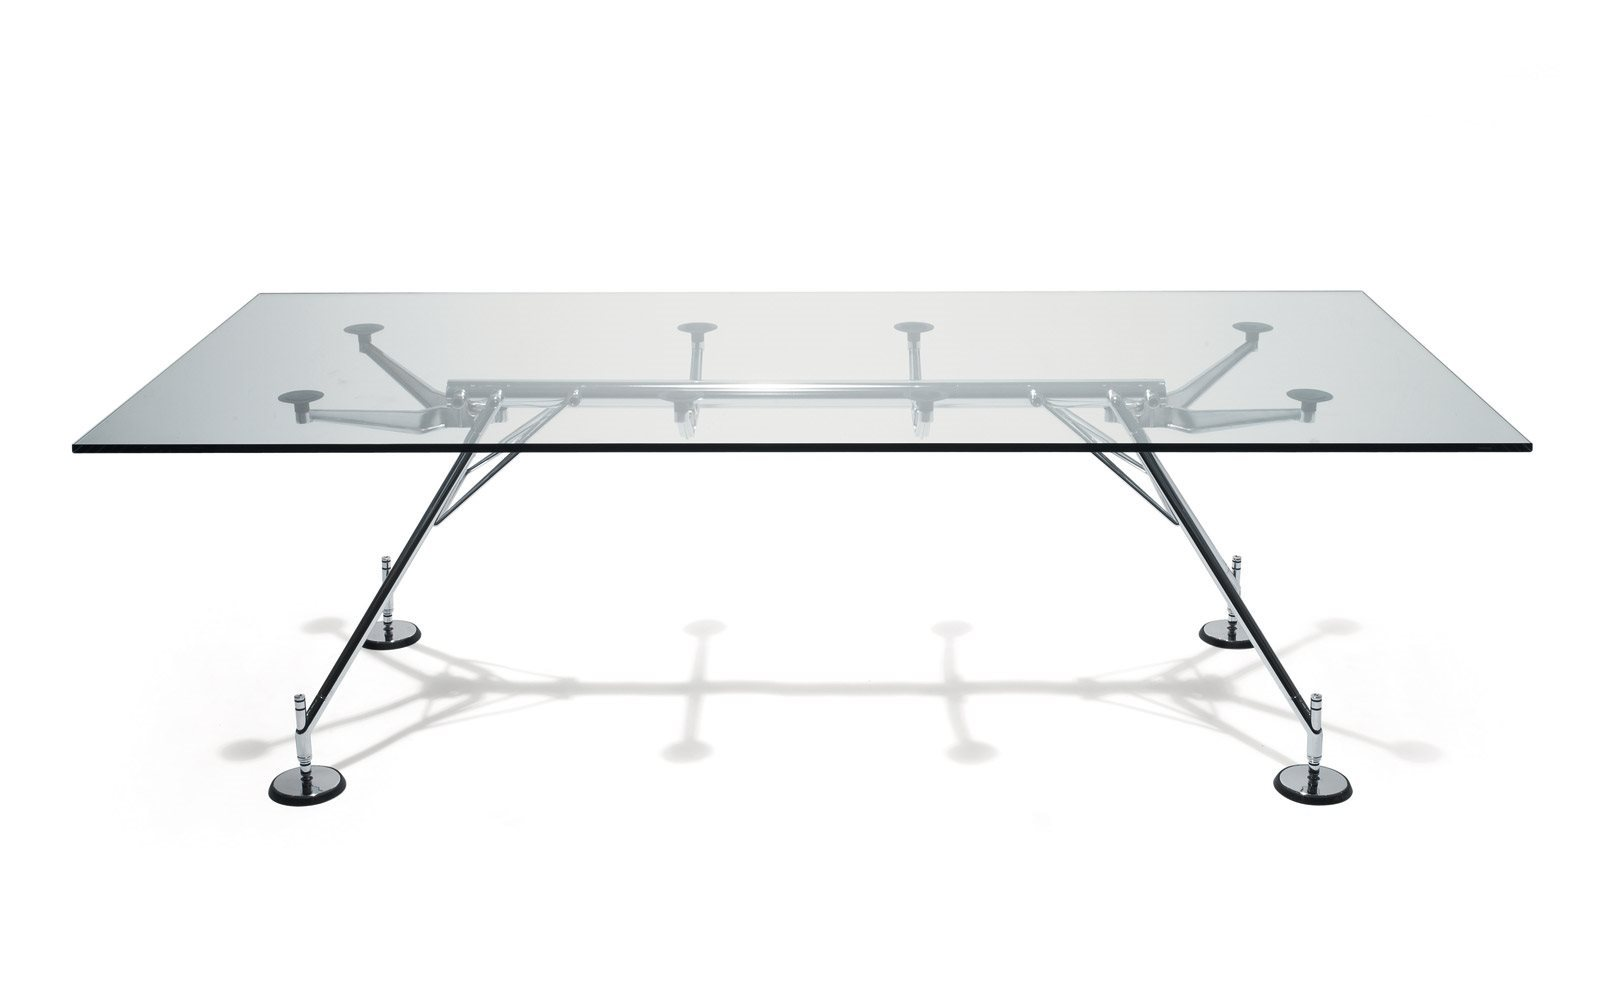 tavolo office inn tecno nomos al centro dell'arredamento ligure